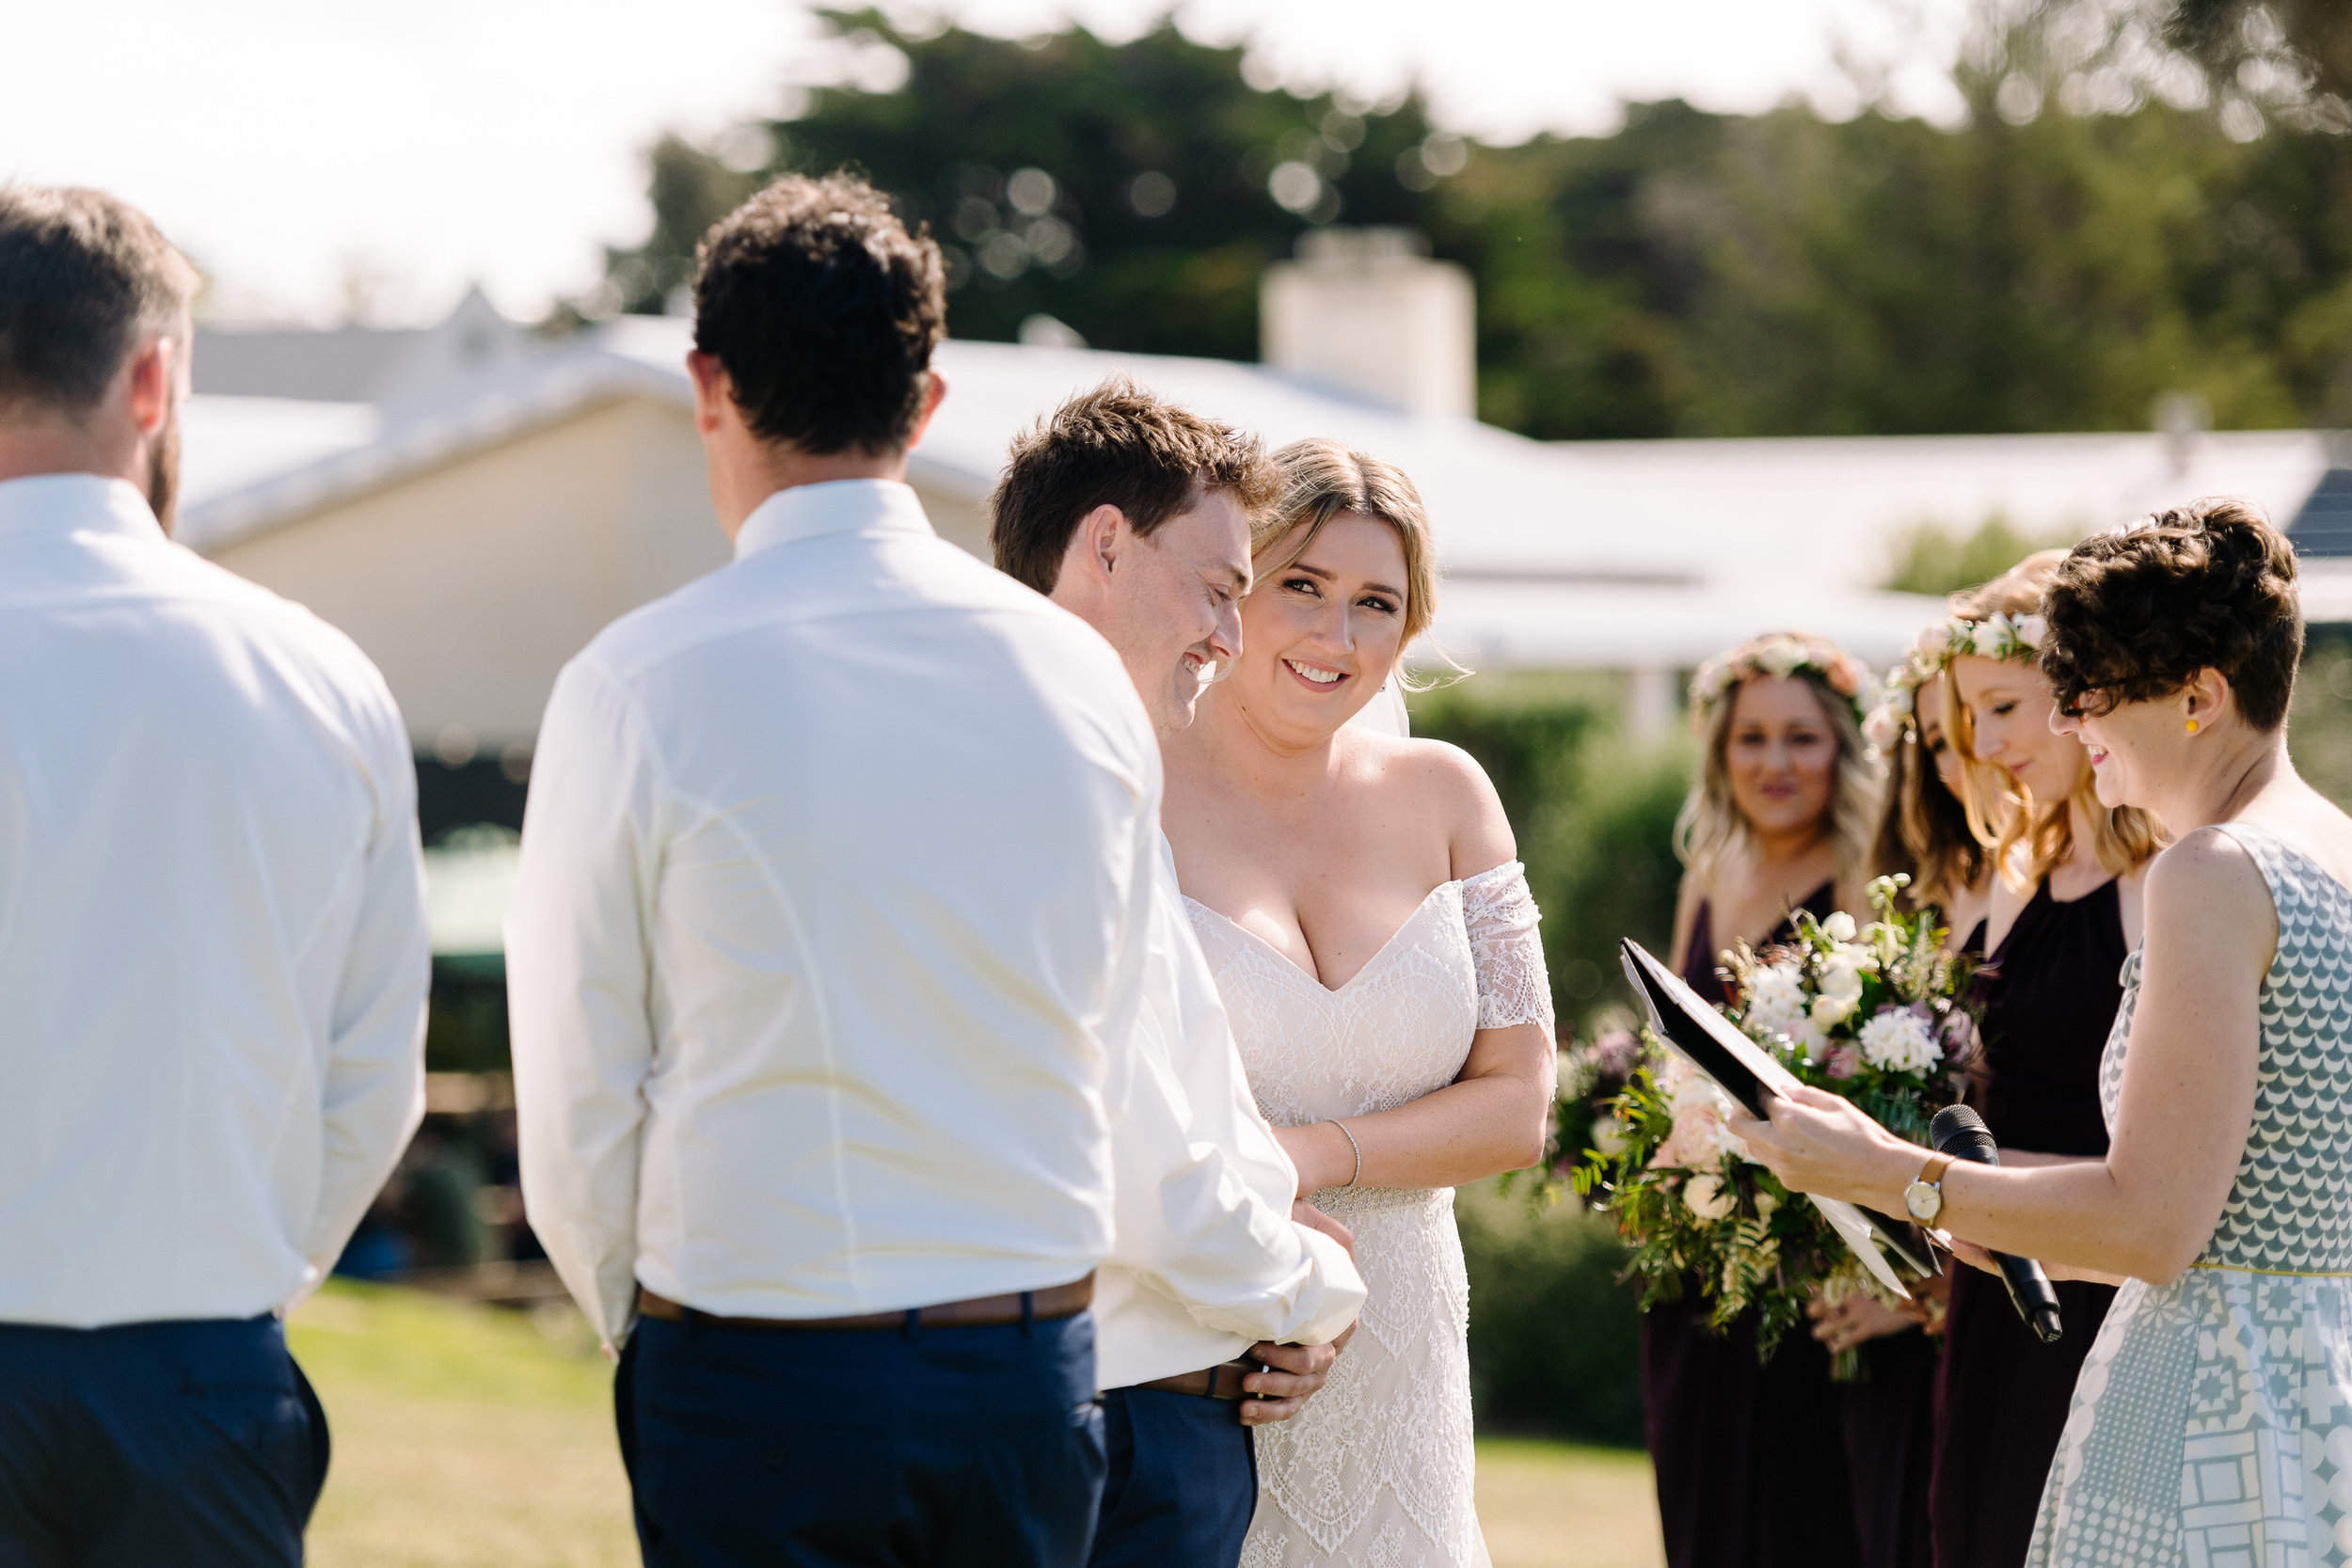 Justin_And_Jim_Photography_Portsea_Pub_Wedding62.JPG